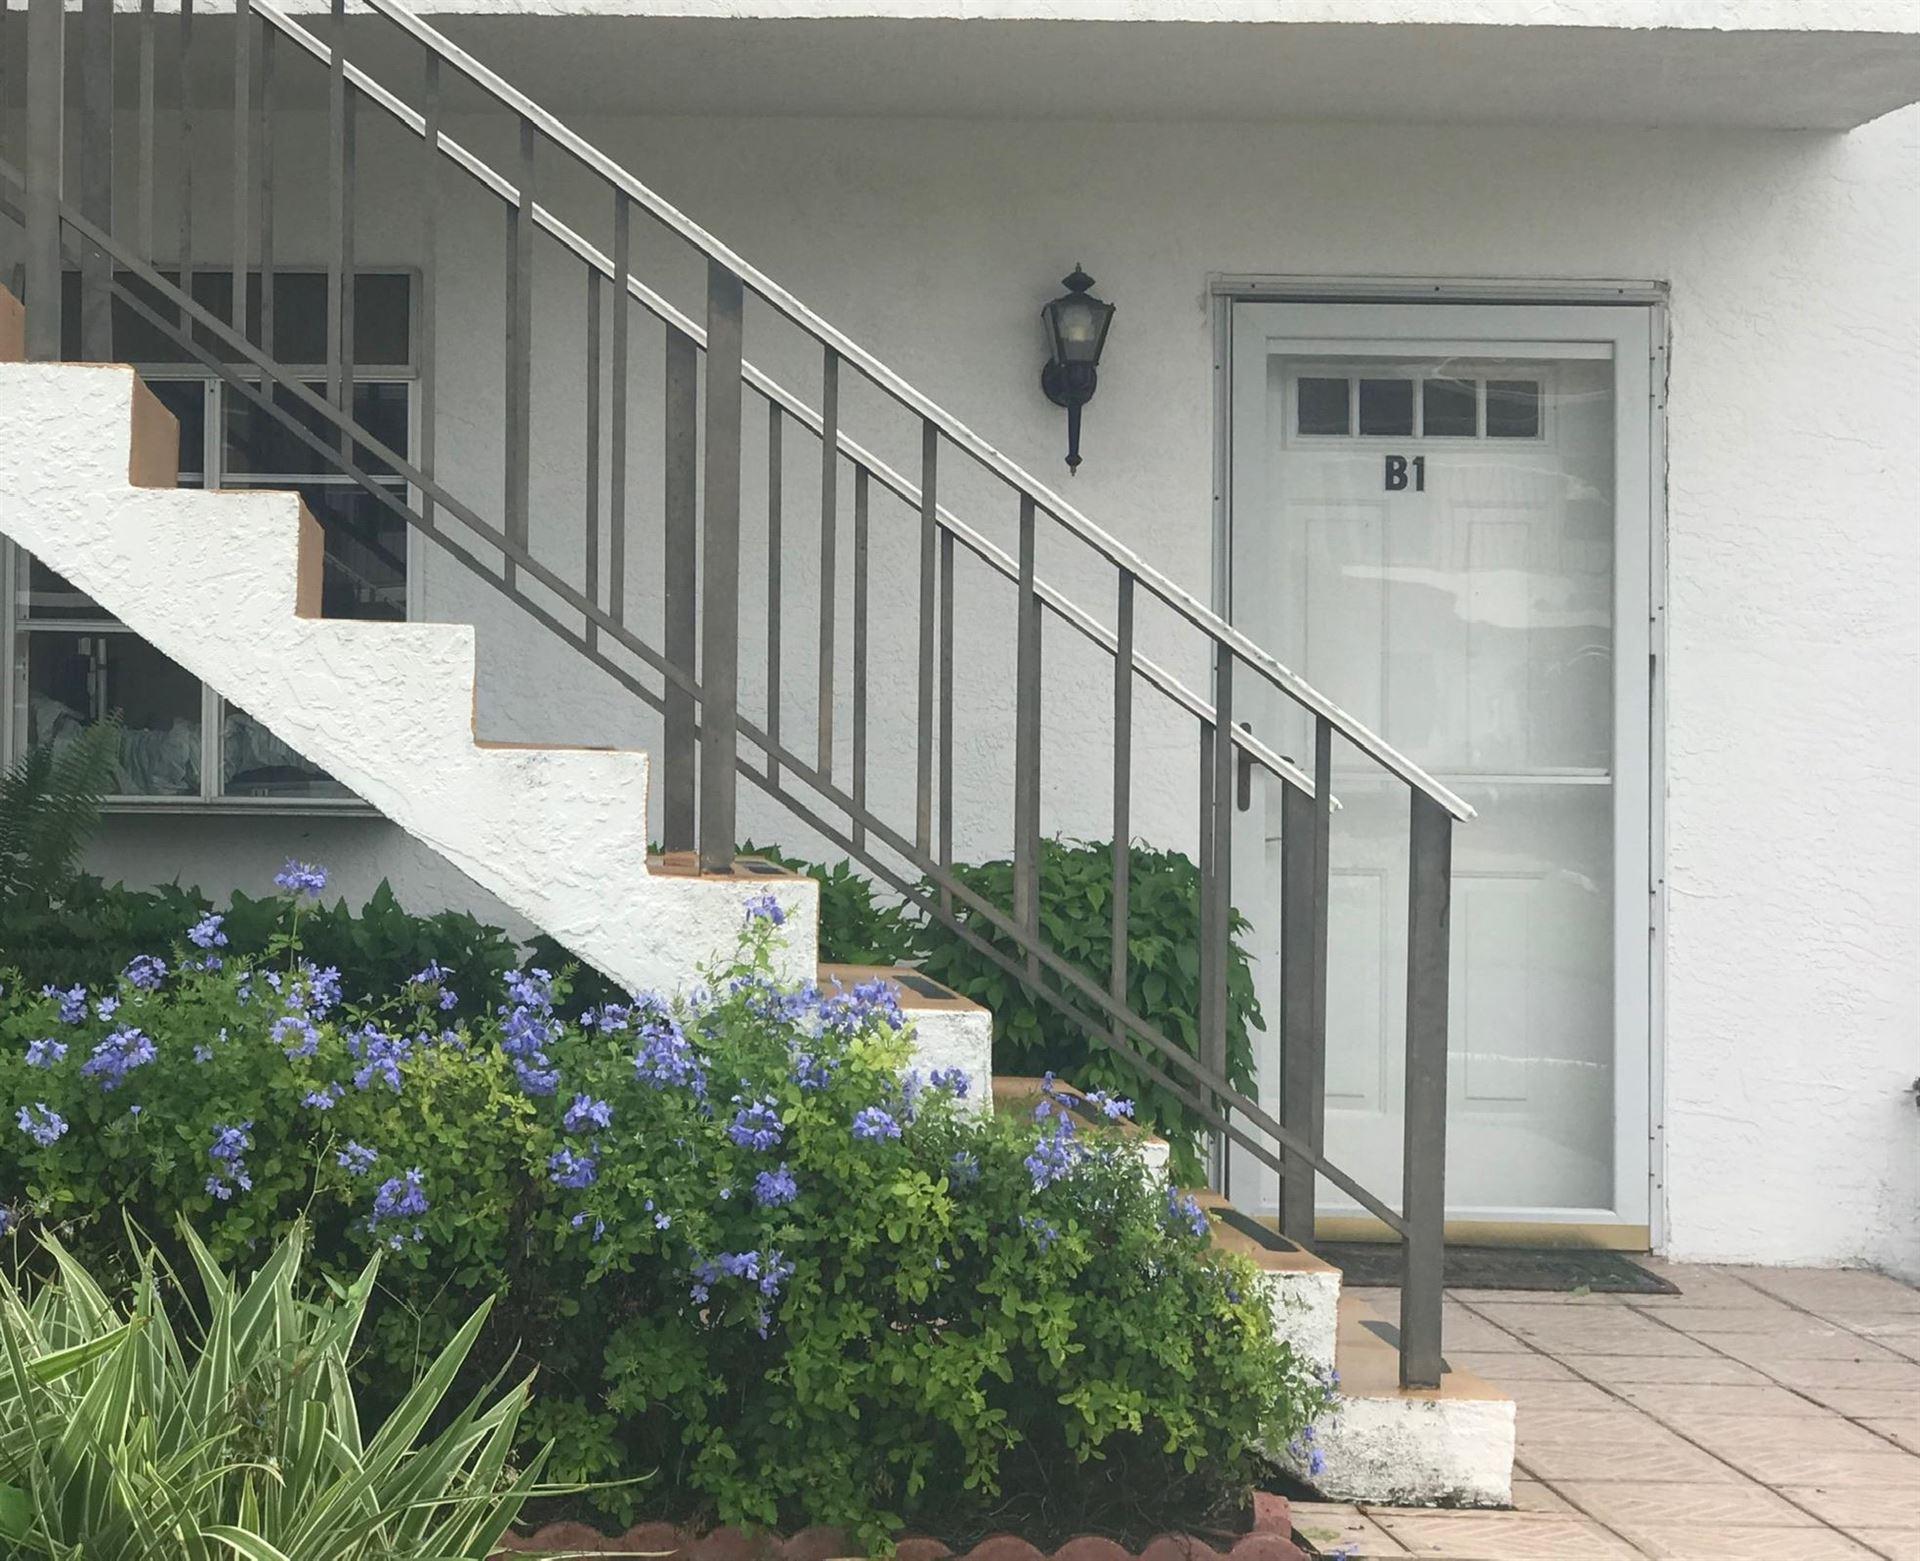 134 Lakes End Drive #B1, Fort Pierce, FL 34982 - #: RX-10563340